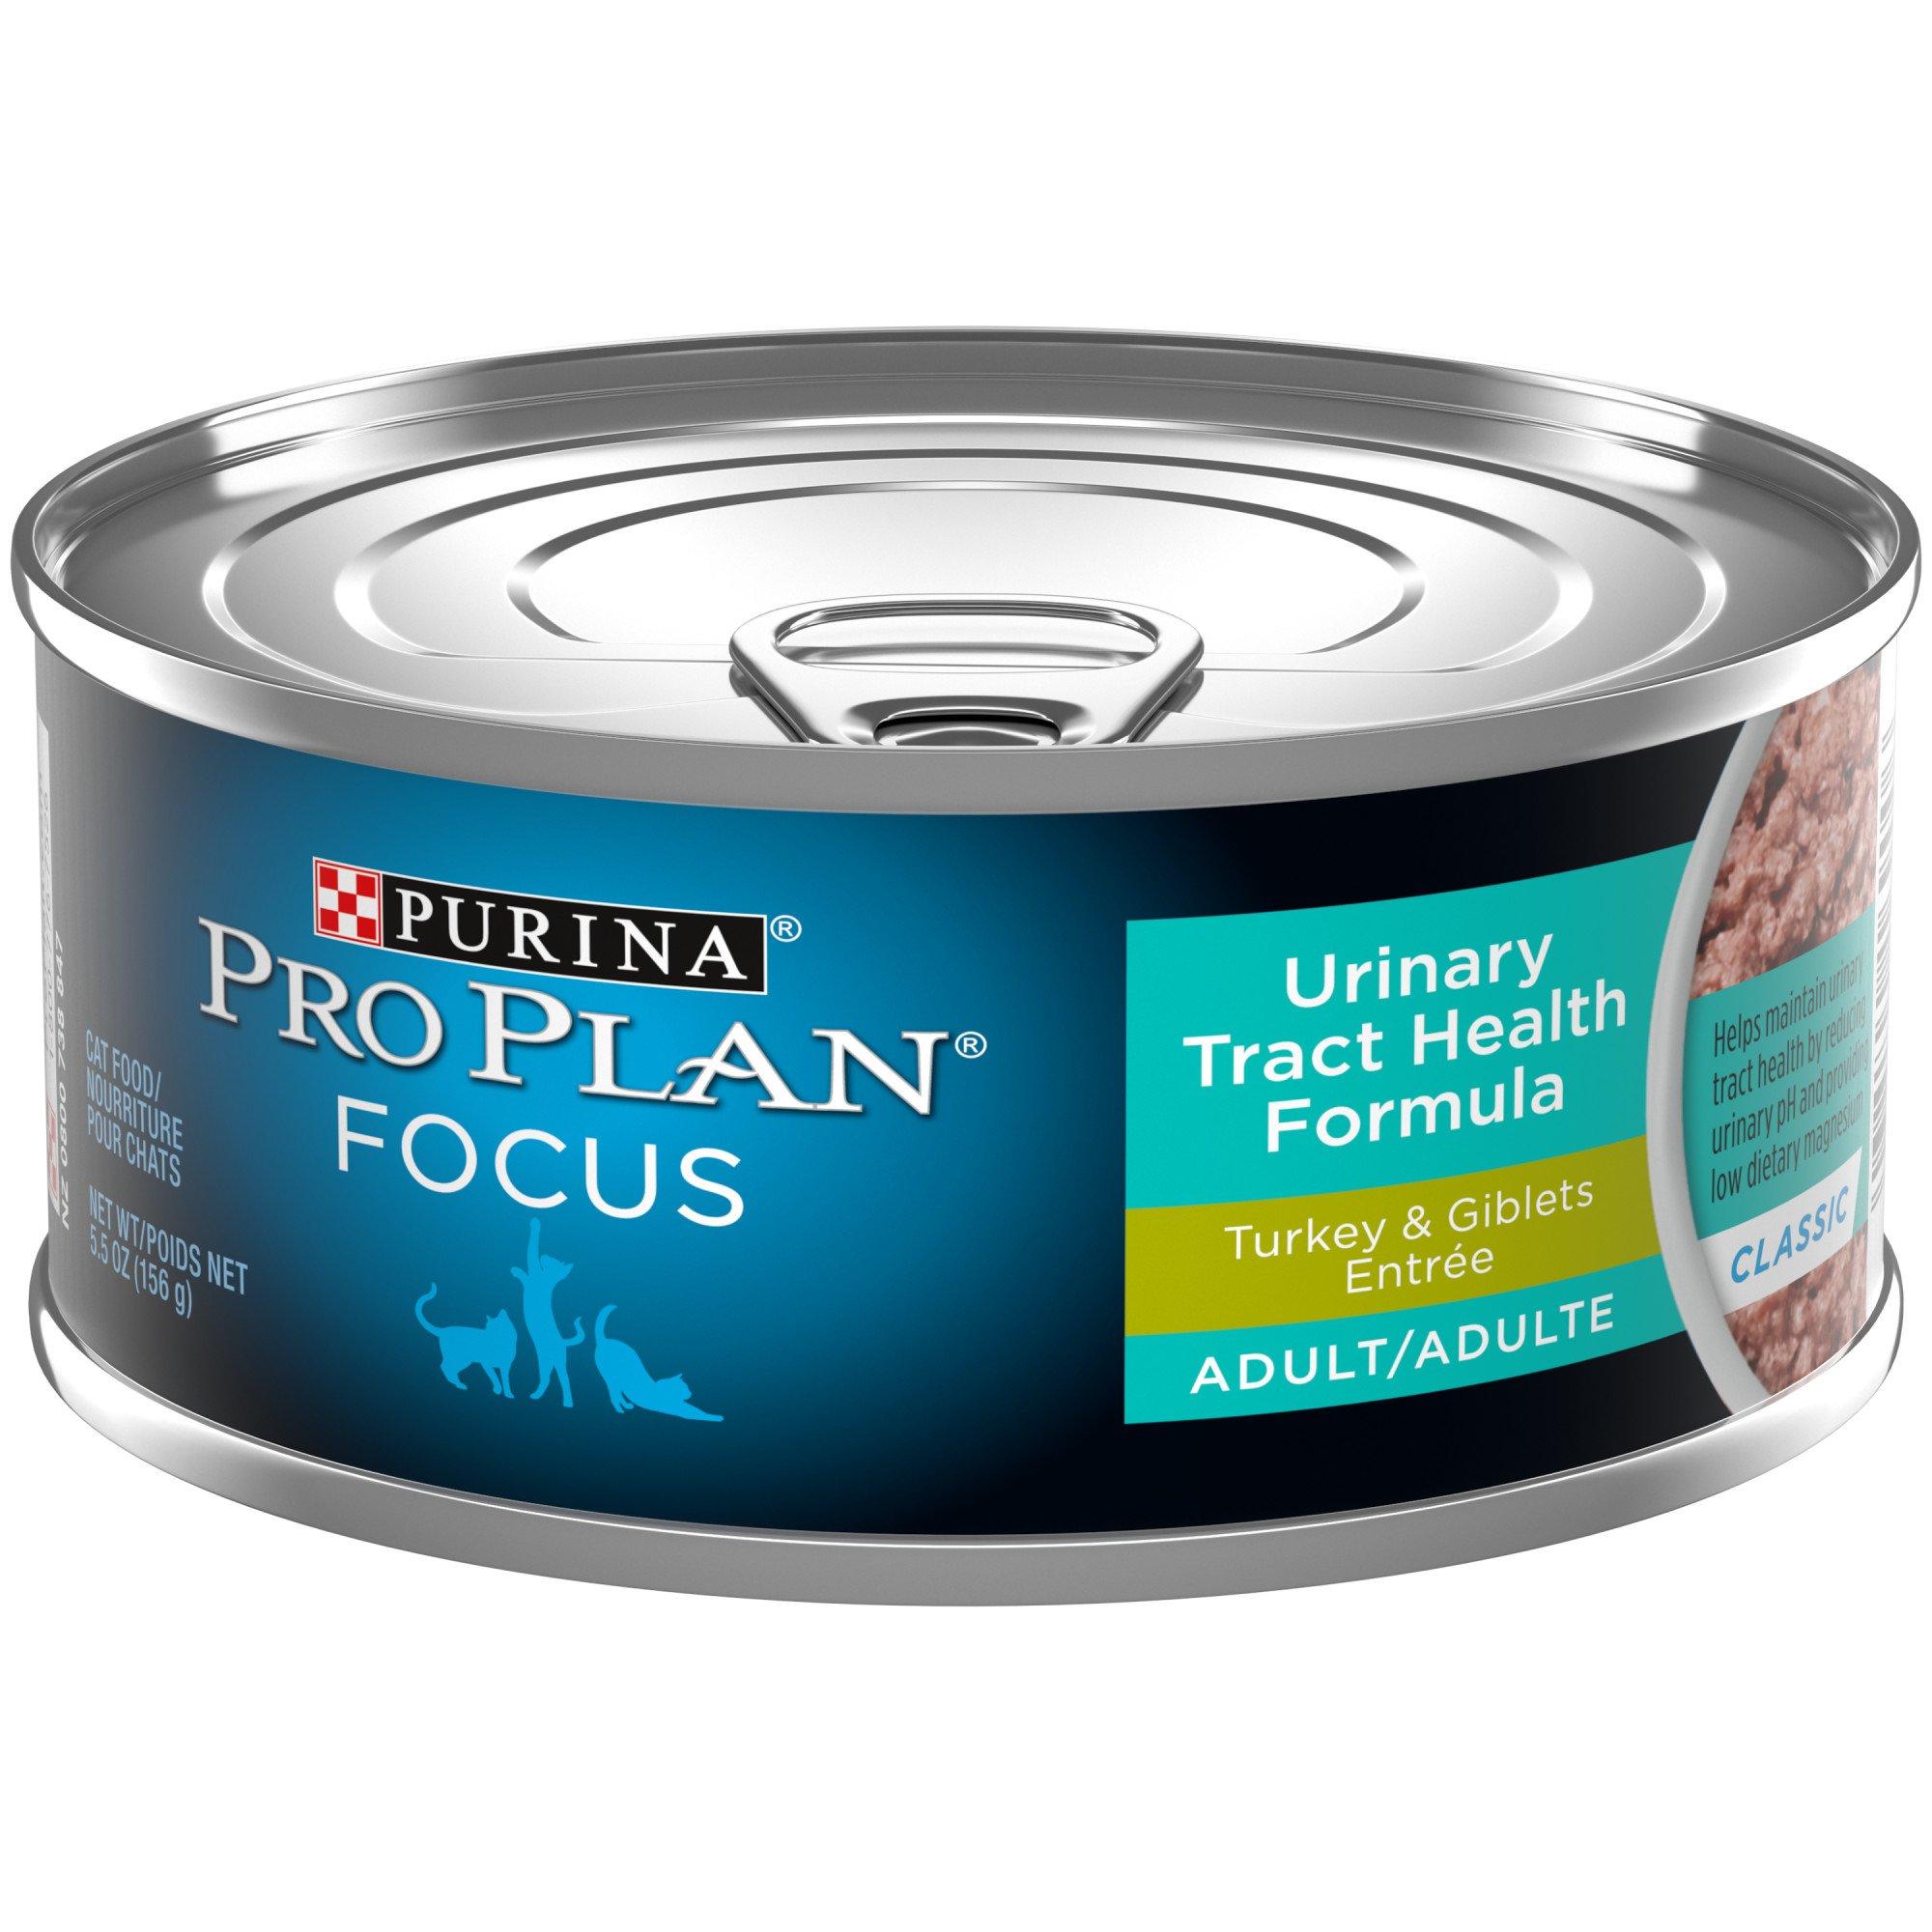 Dry Cat Food No Grain Urinary Tract Help